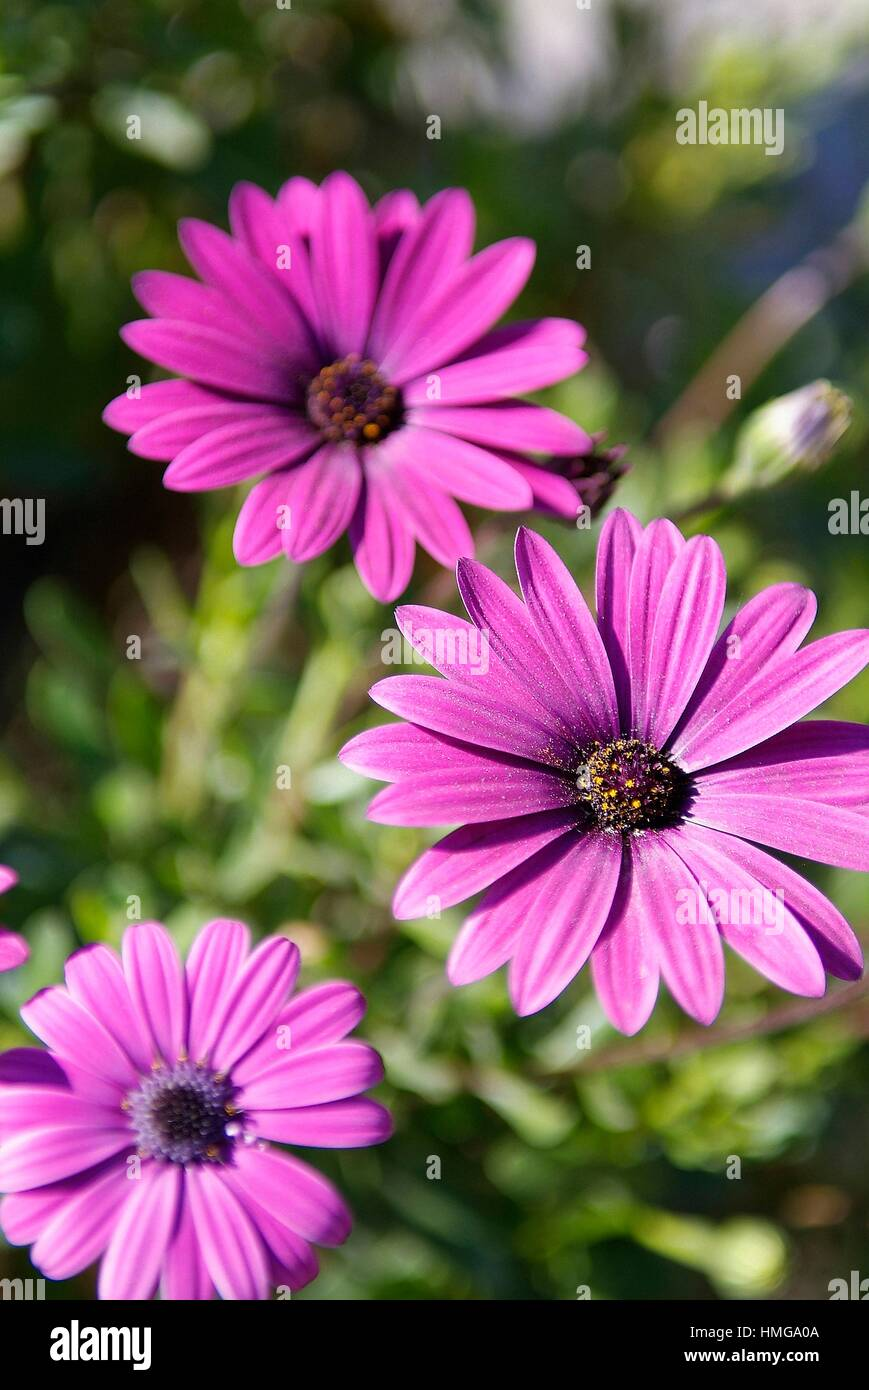 maroon daisies flowers close up shot,location porqueres,girona,catalonia,spain,europe,. - Stock Image